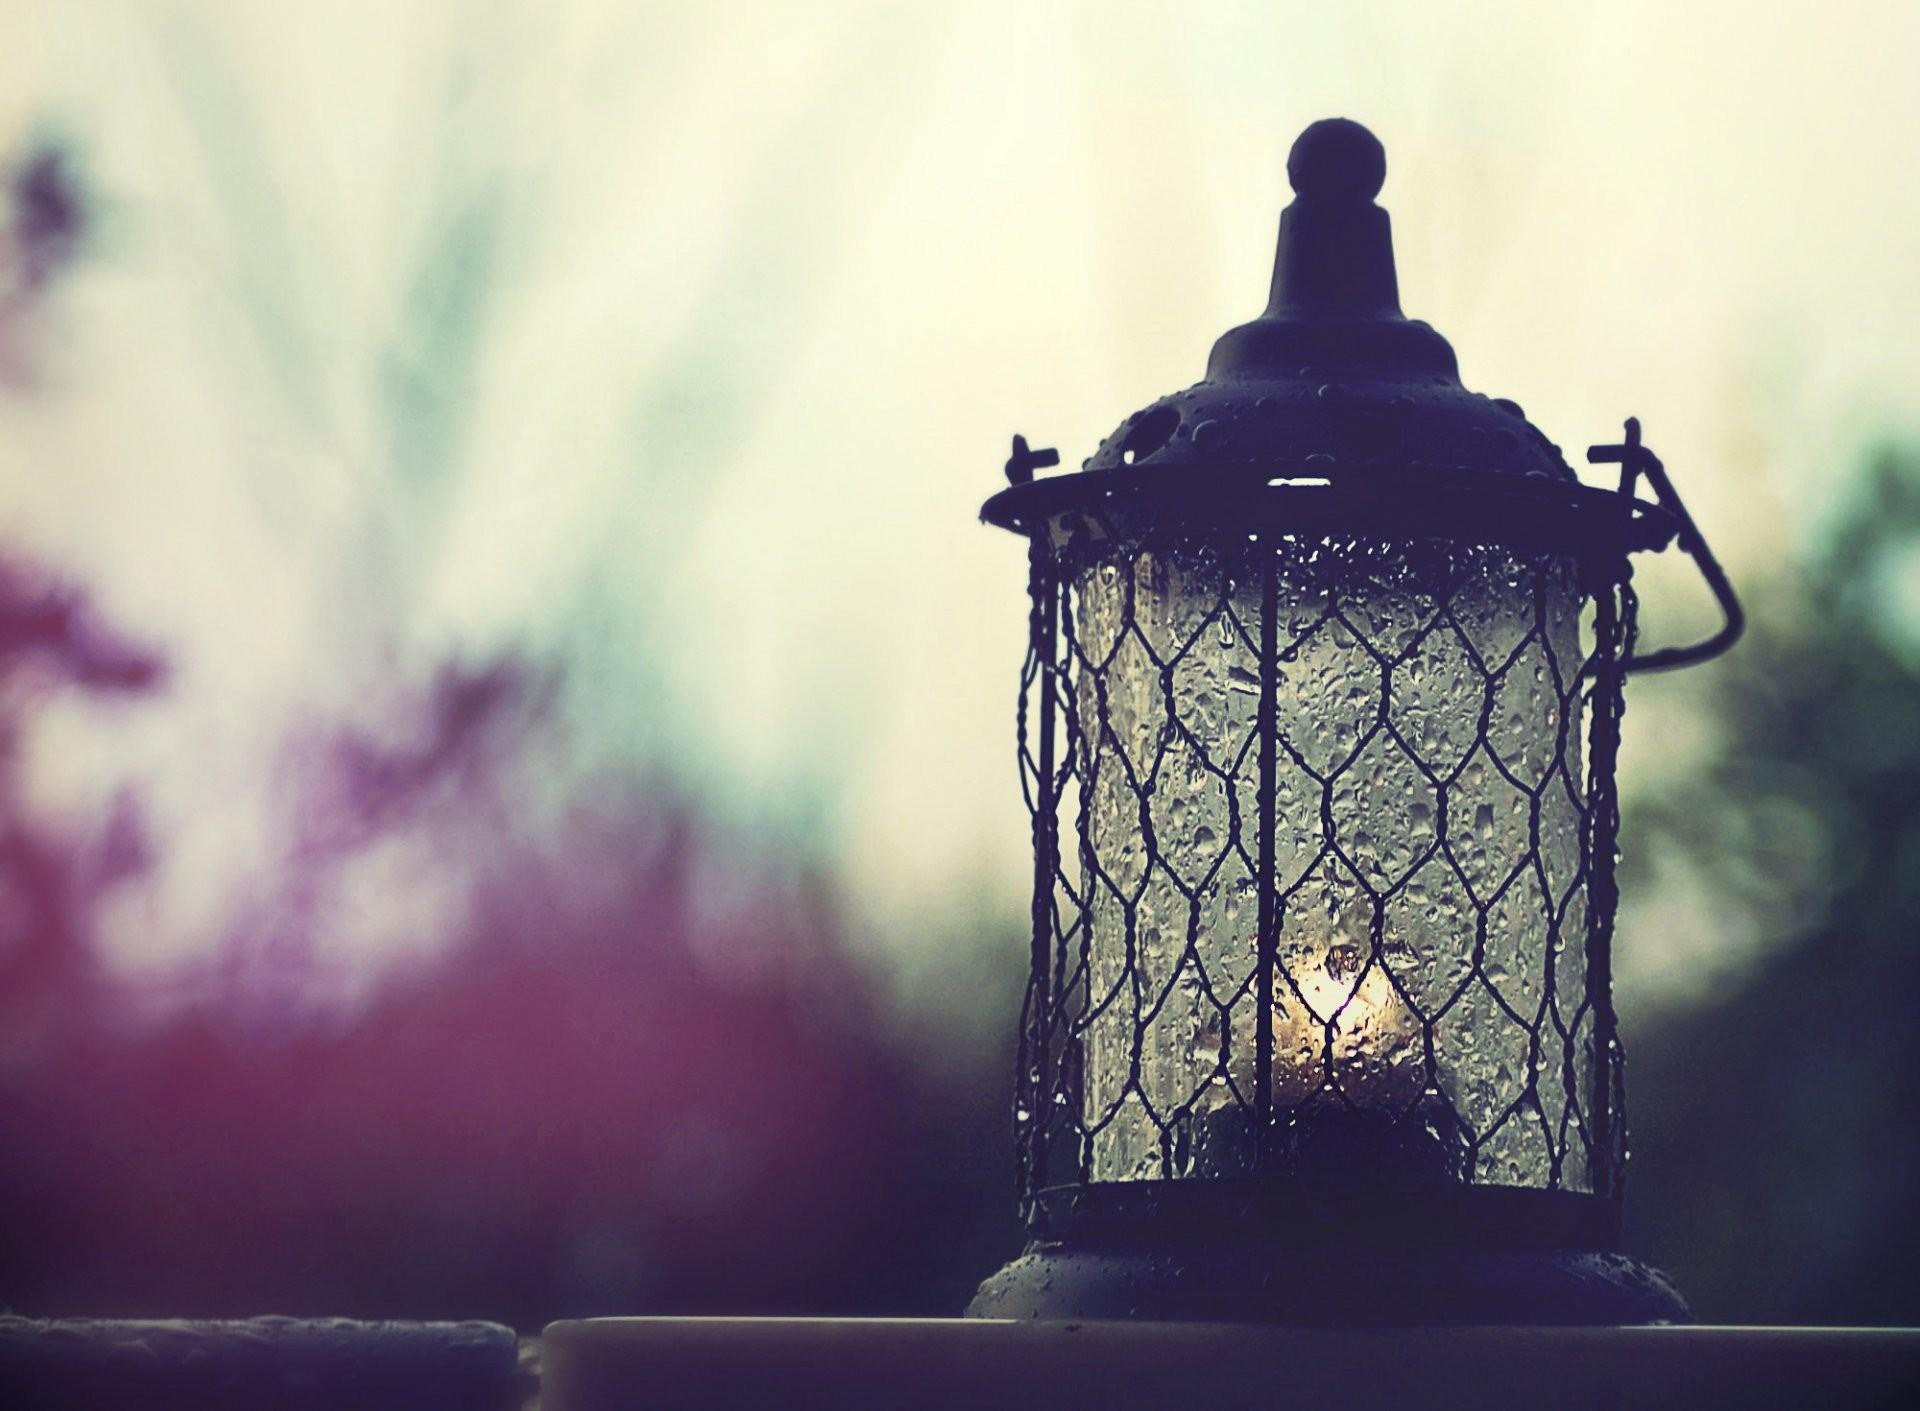 rain light candle light drops silhouettes sky rain mood